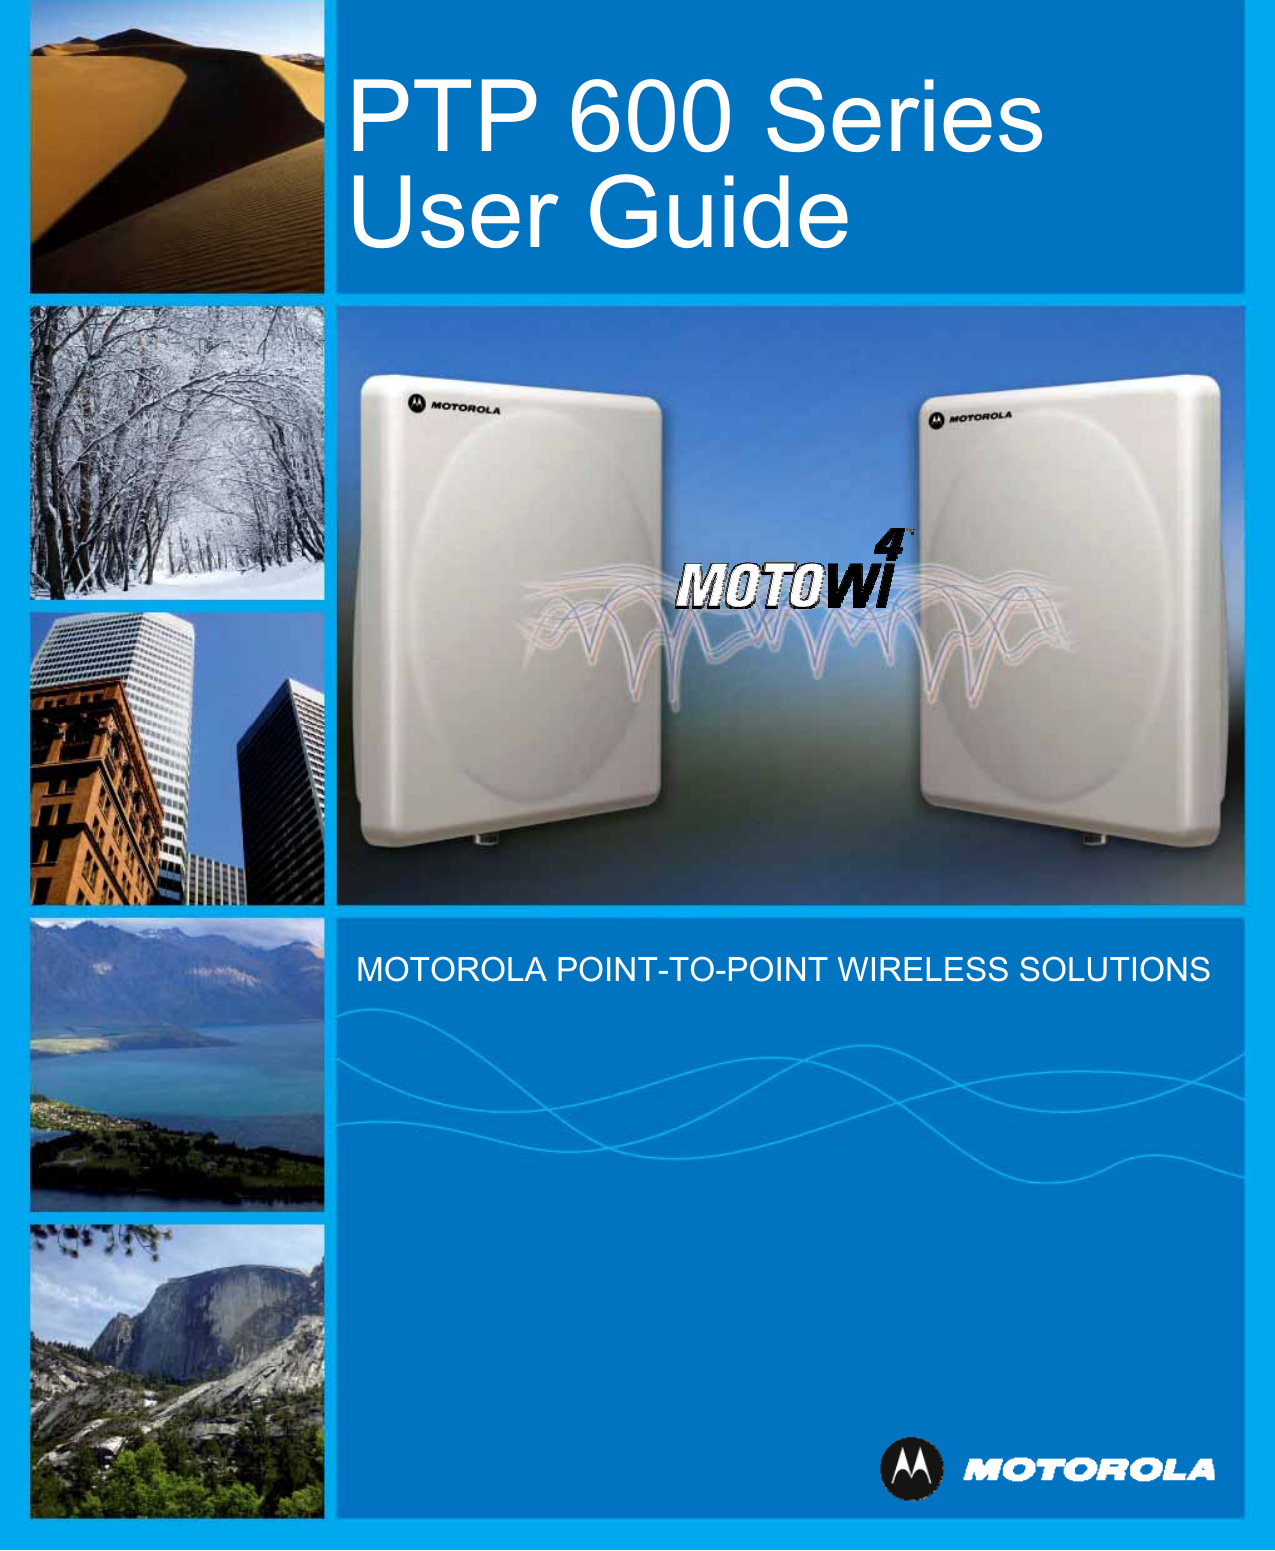 25601 wireless ethernet bridge user manual ptp 600 series user.